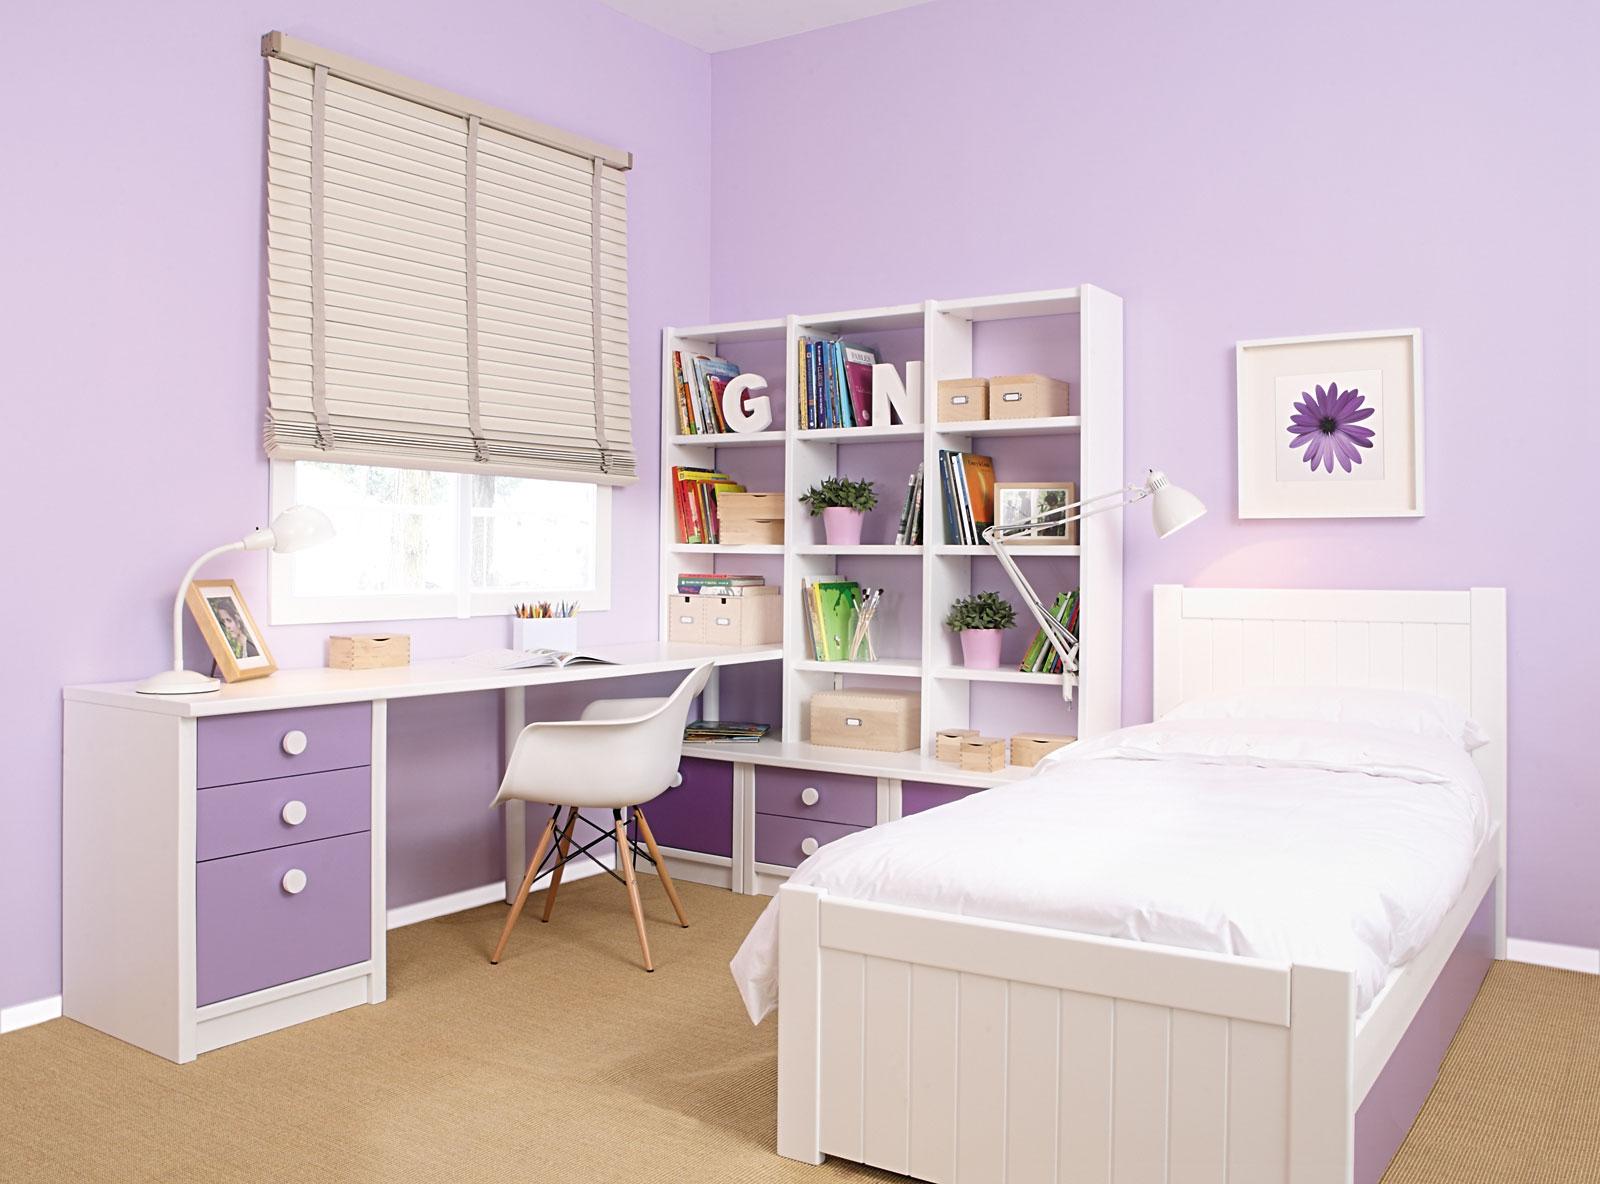 10 dormitorios juveniles modernos ideas para decorar - Habitaciones juveniles de chicas ...